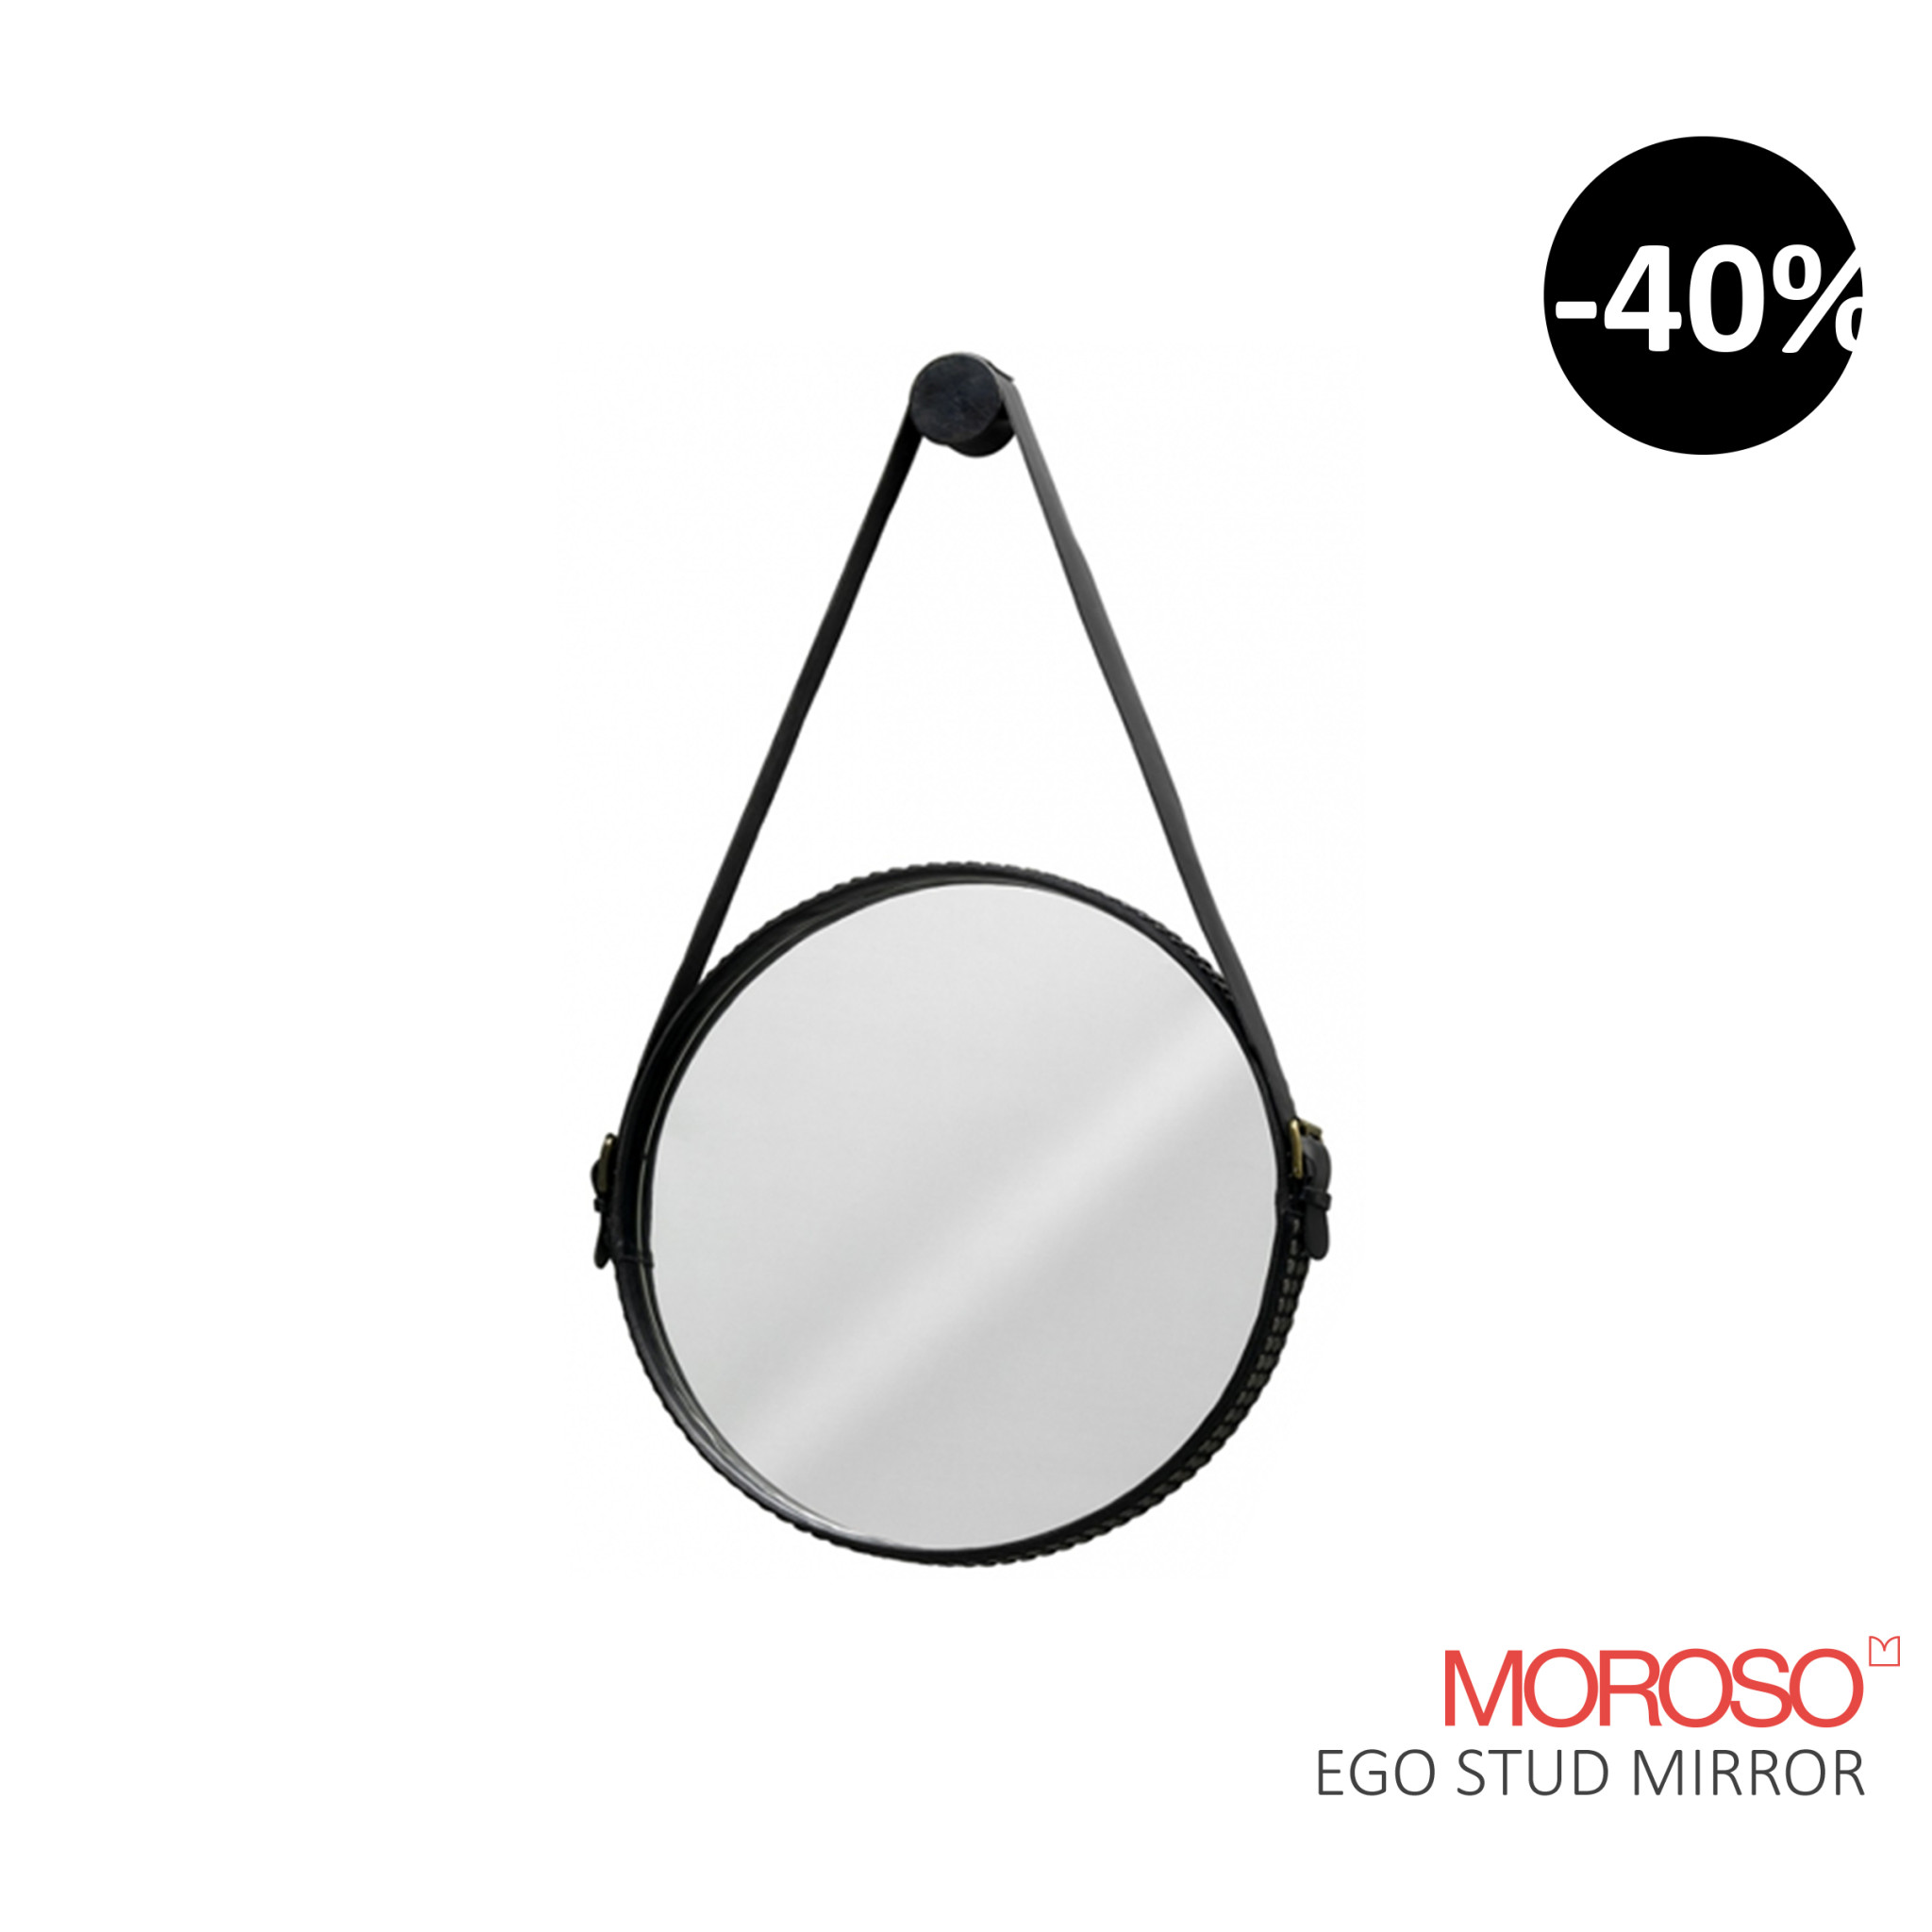 MOROSO Ego stud mirror